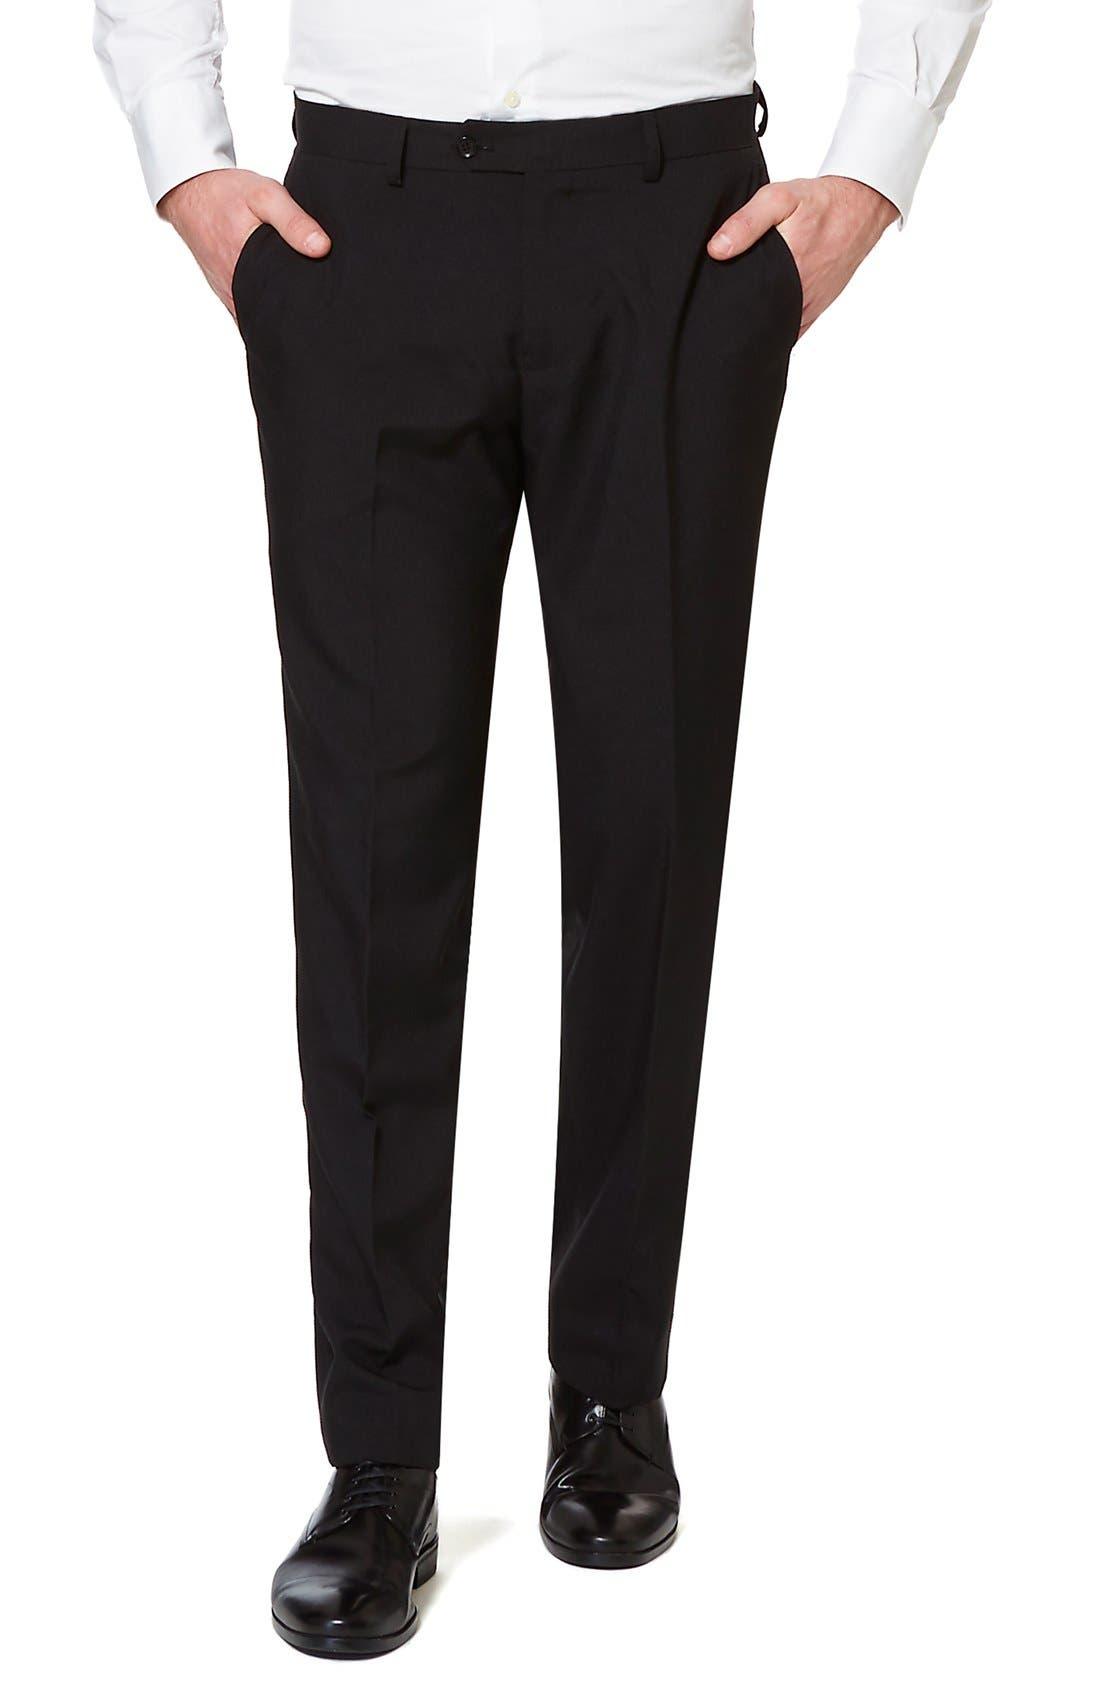 'Black Knight' Trim Fit Two-Piece Suit with Tie,                             Alternate thumbnail 3, color,                             001